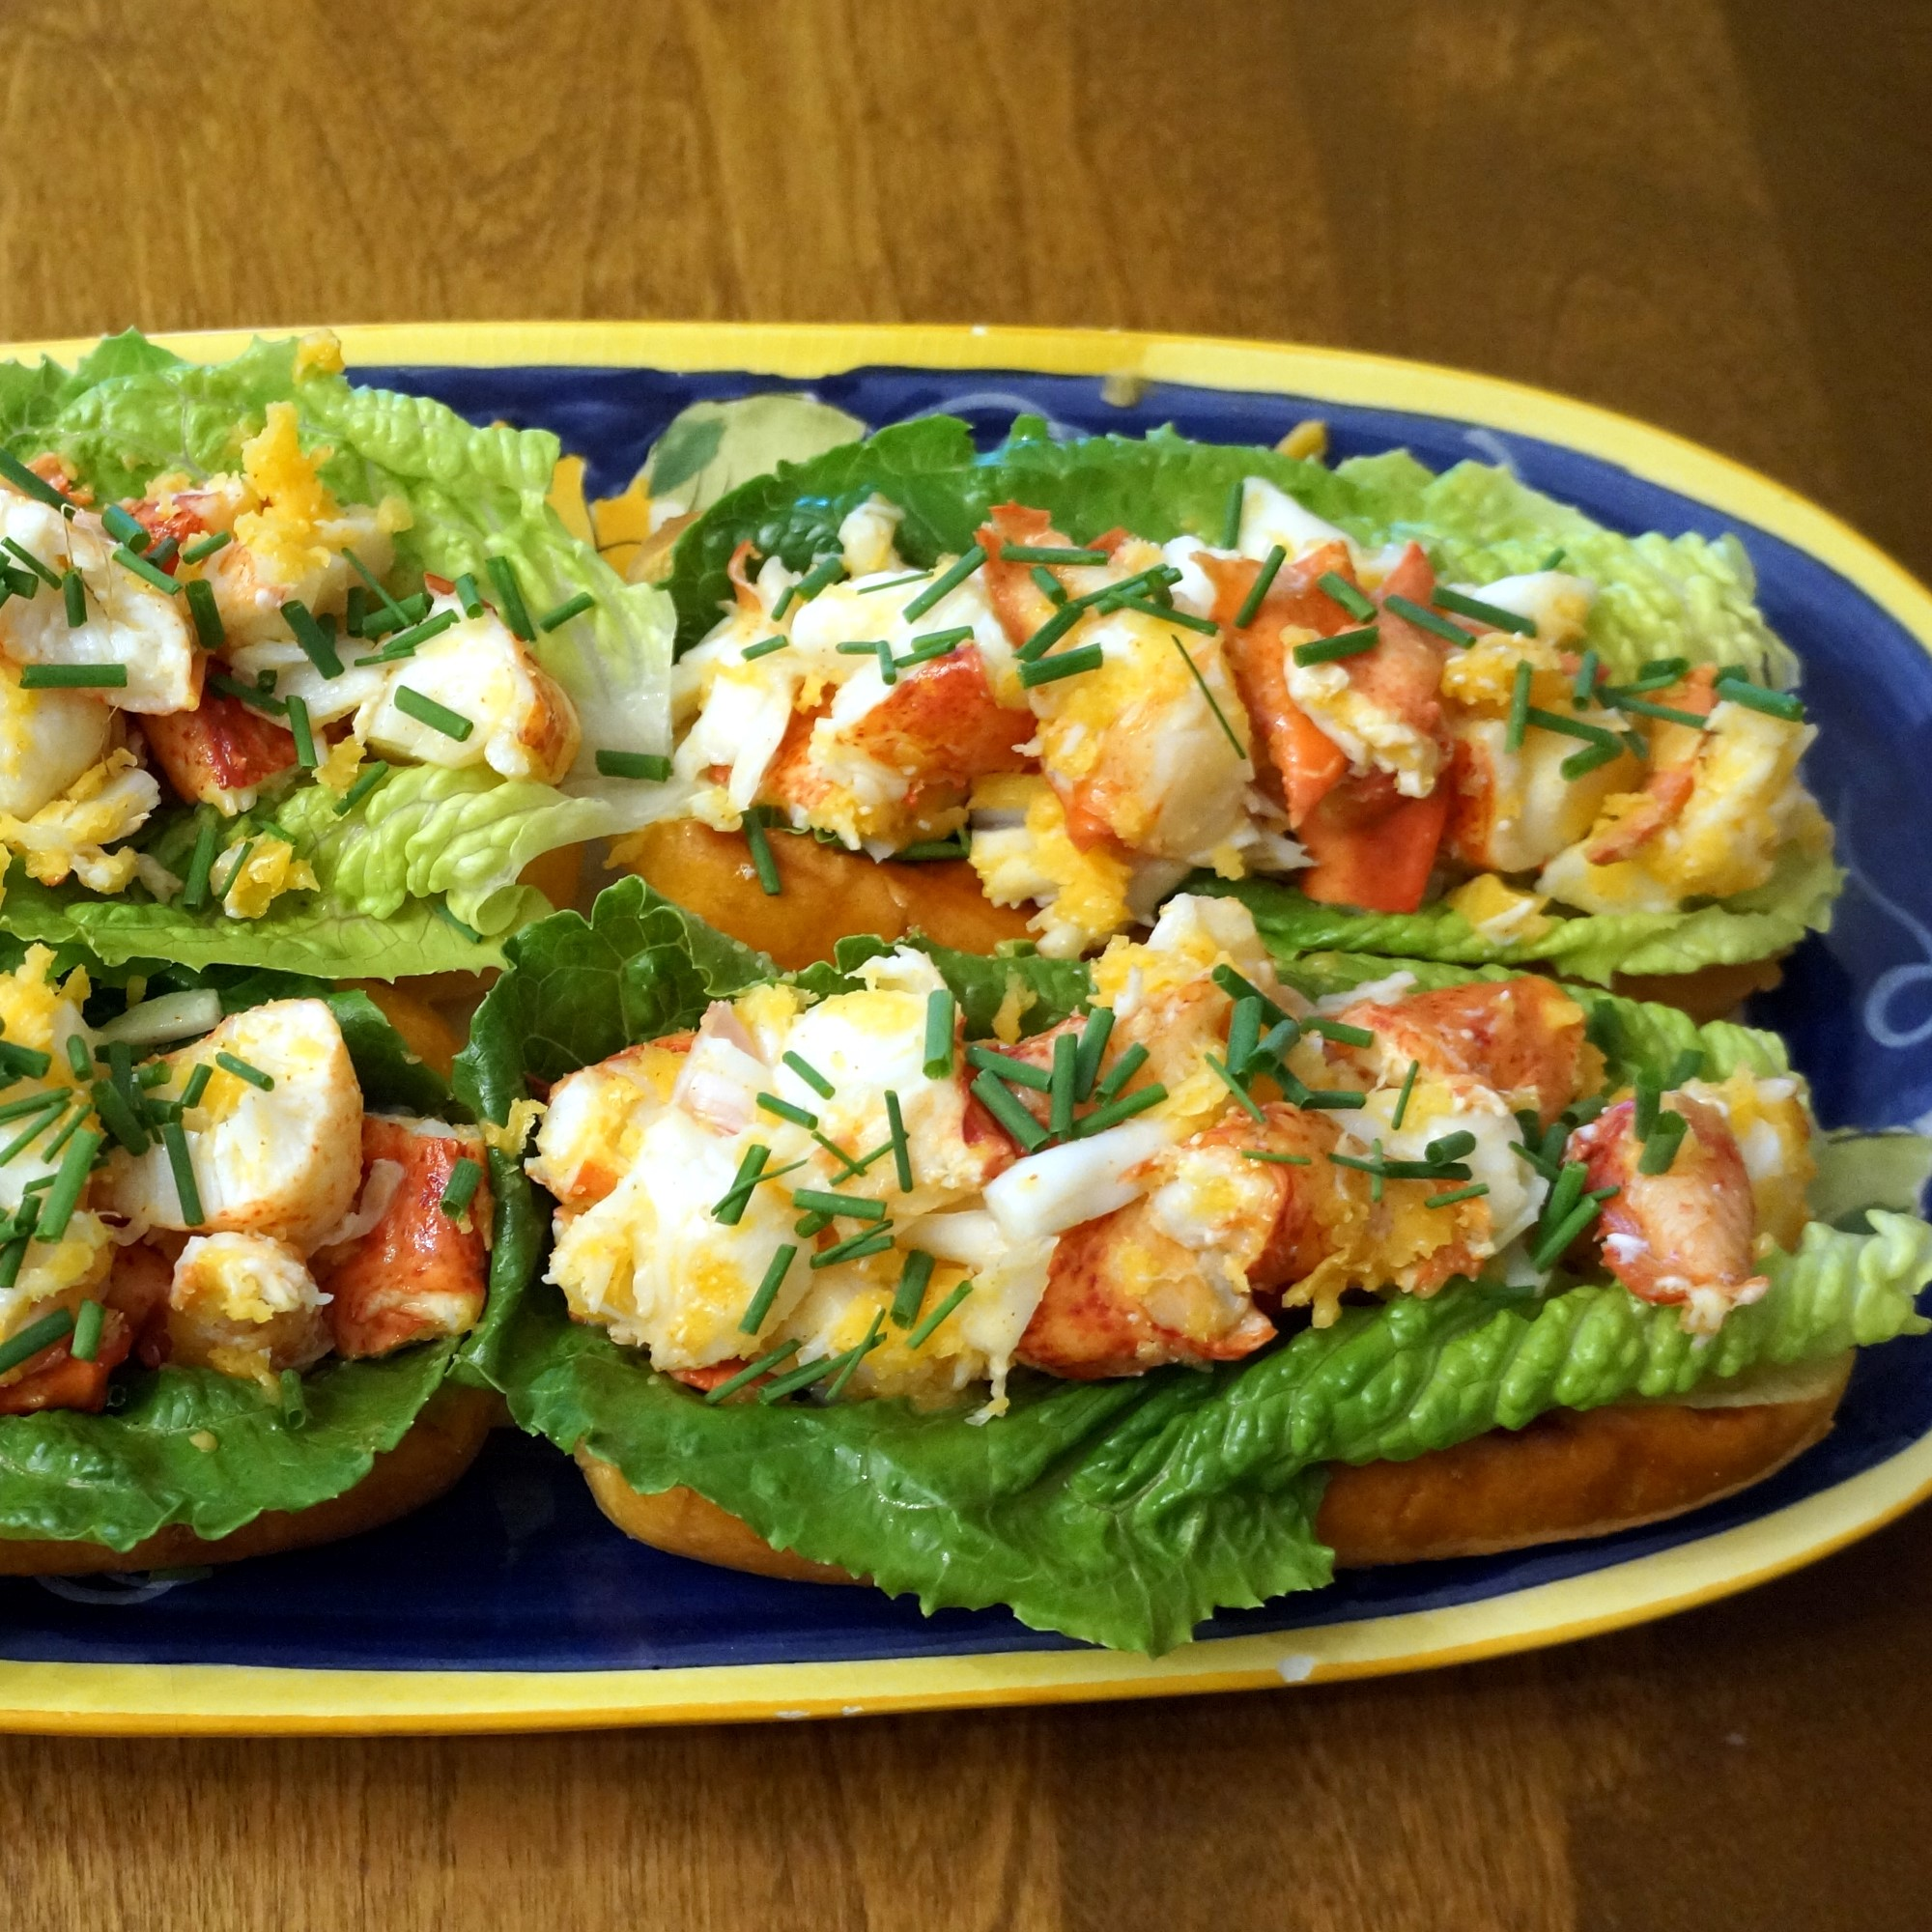 Lobster Roll on Brioche